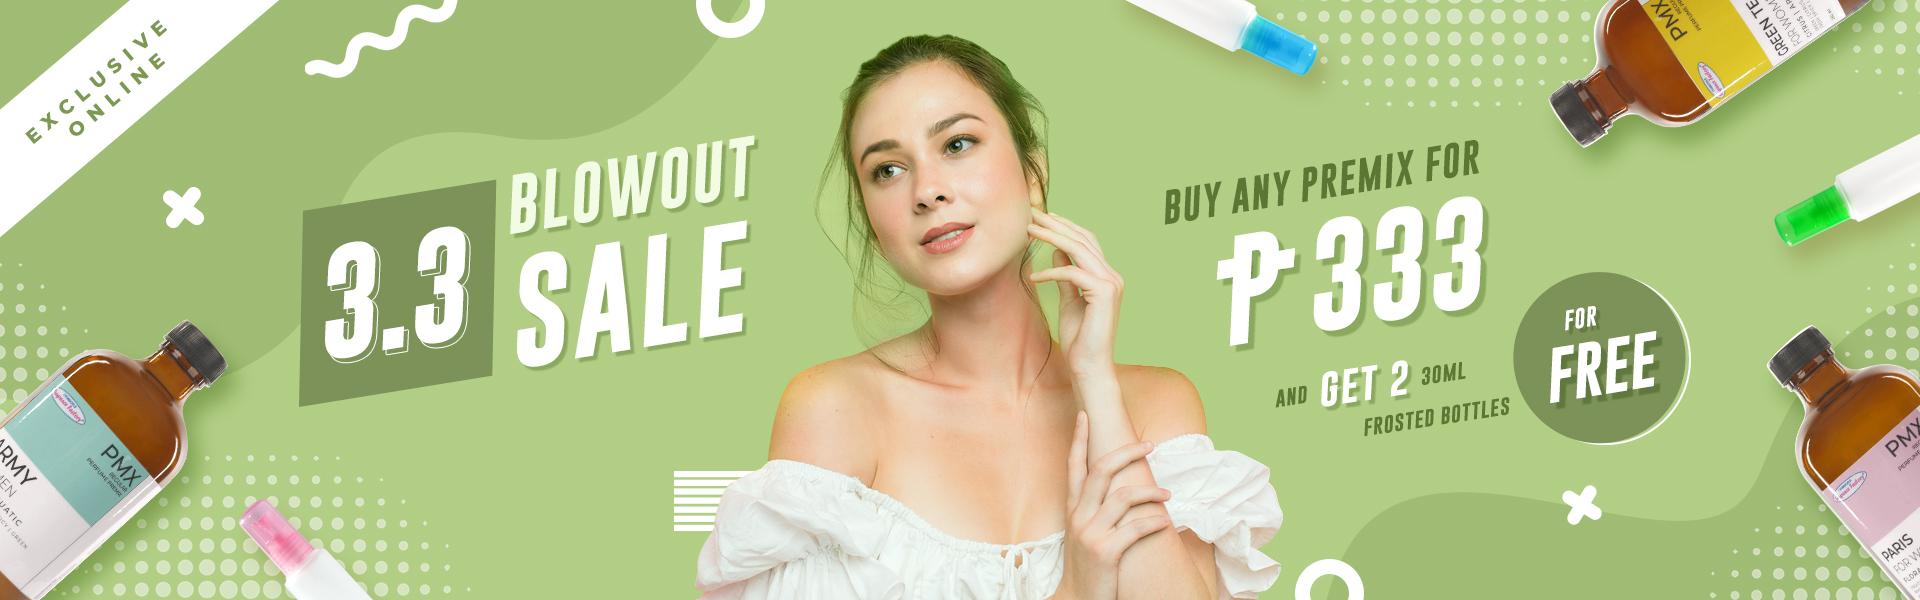 3.3 blowout sale webstore banner